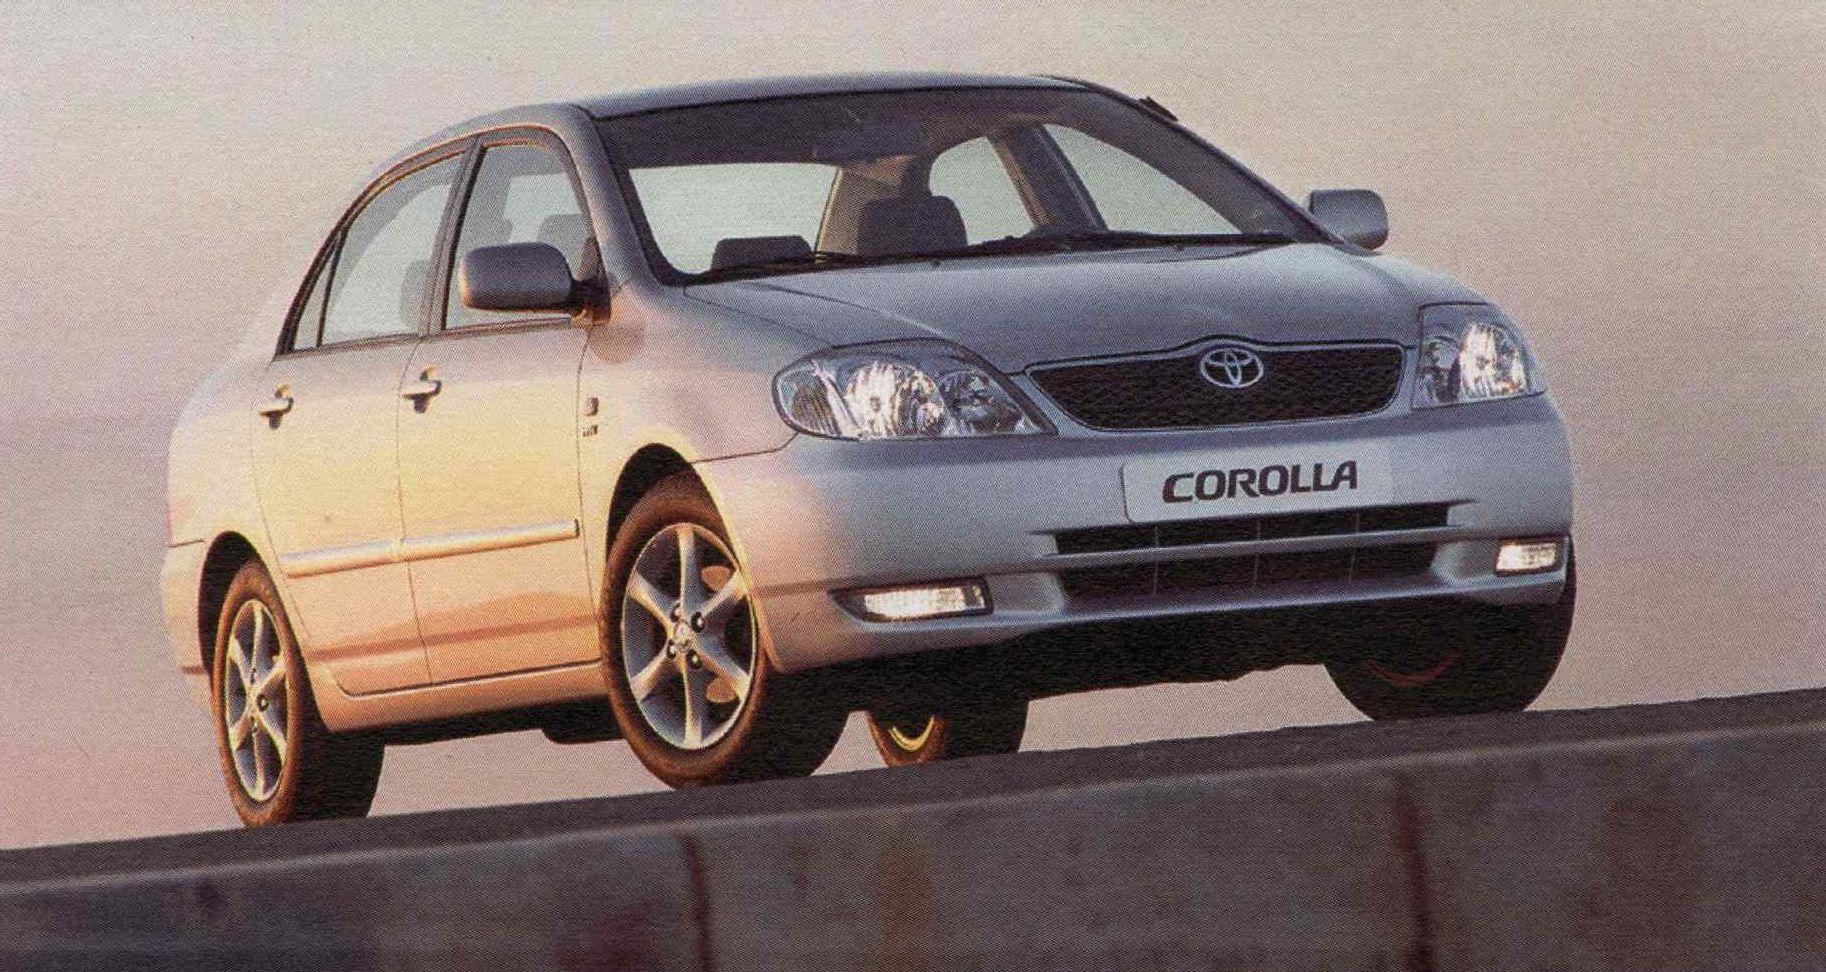 Kelebihan Corolla 2003 Review